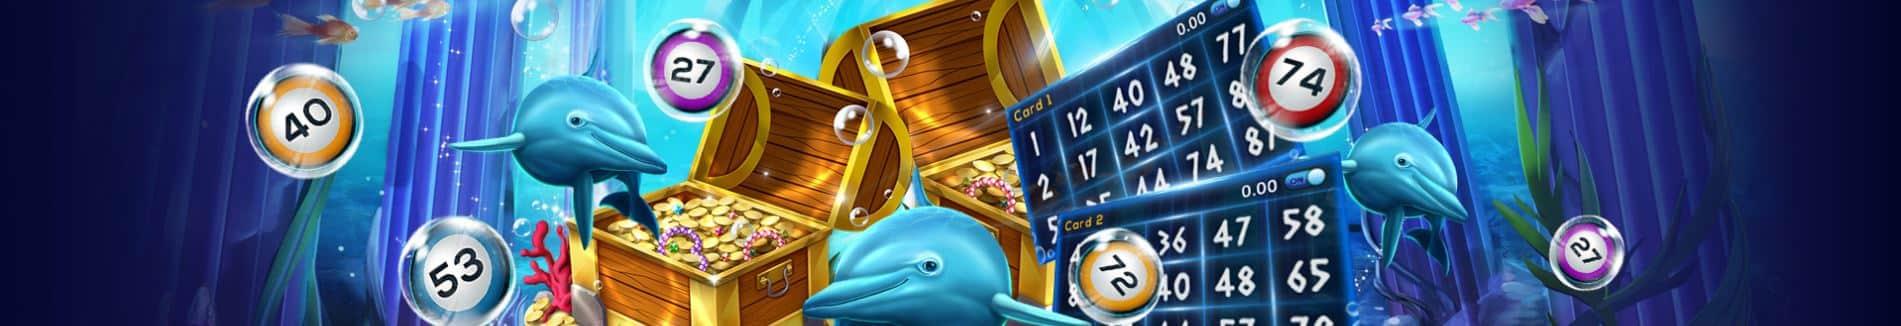 Neptune Bingo Jokerslot191